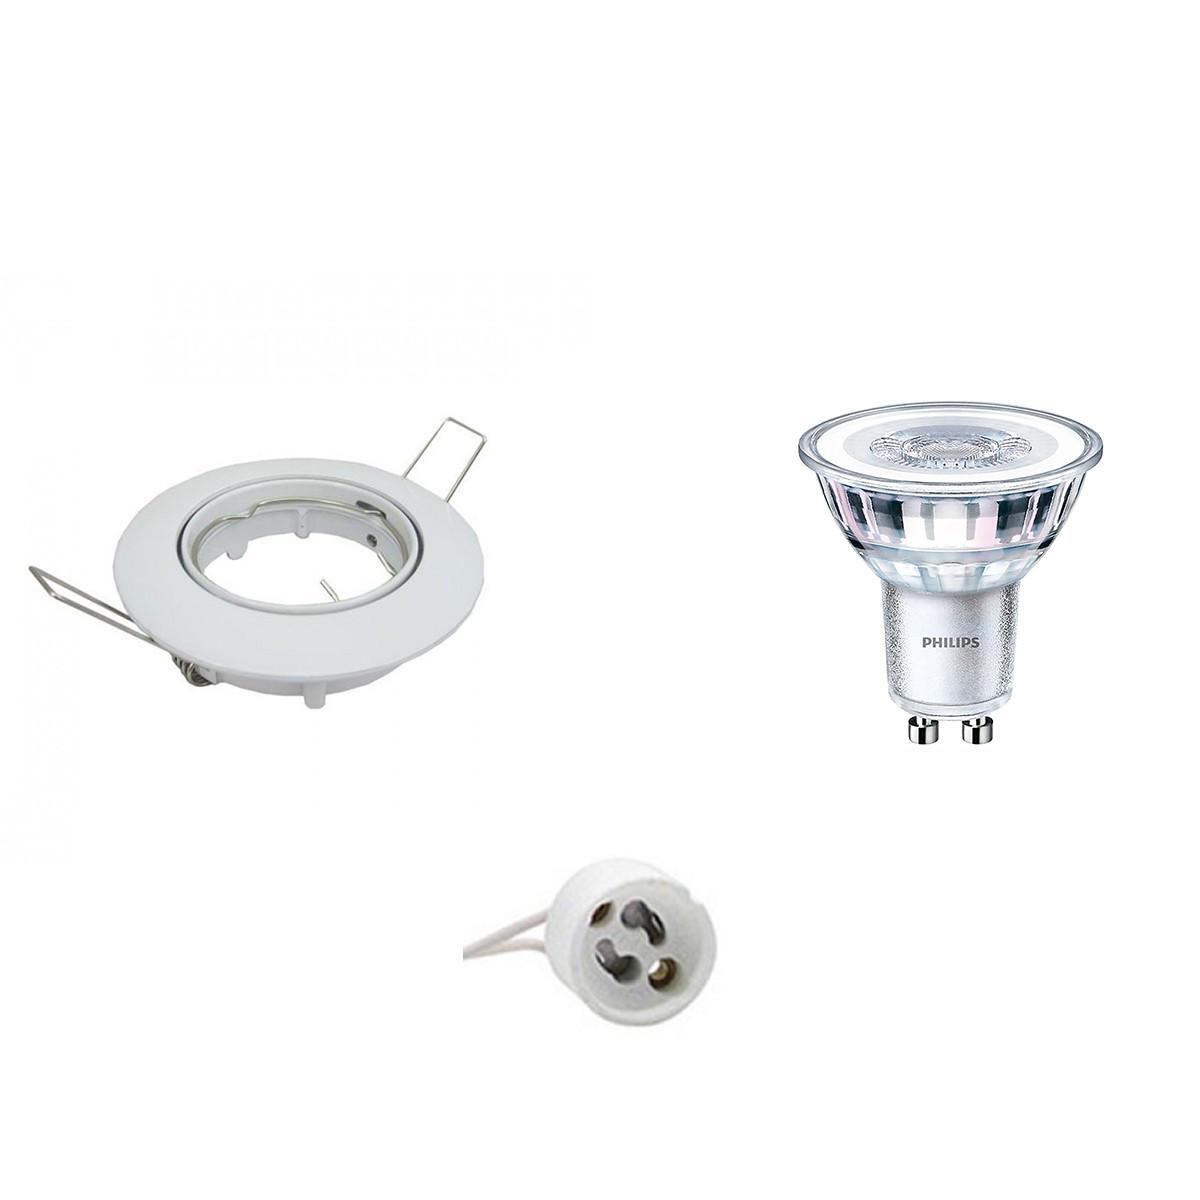 PHILIPS - LED Spot Set - CorePro 827 36D - GU10 Fitting - Dimbaar - Inbouw Rond - Glans Wit - 4W - W